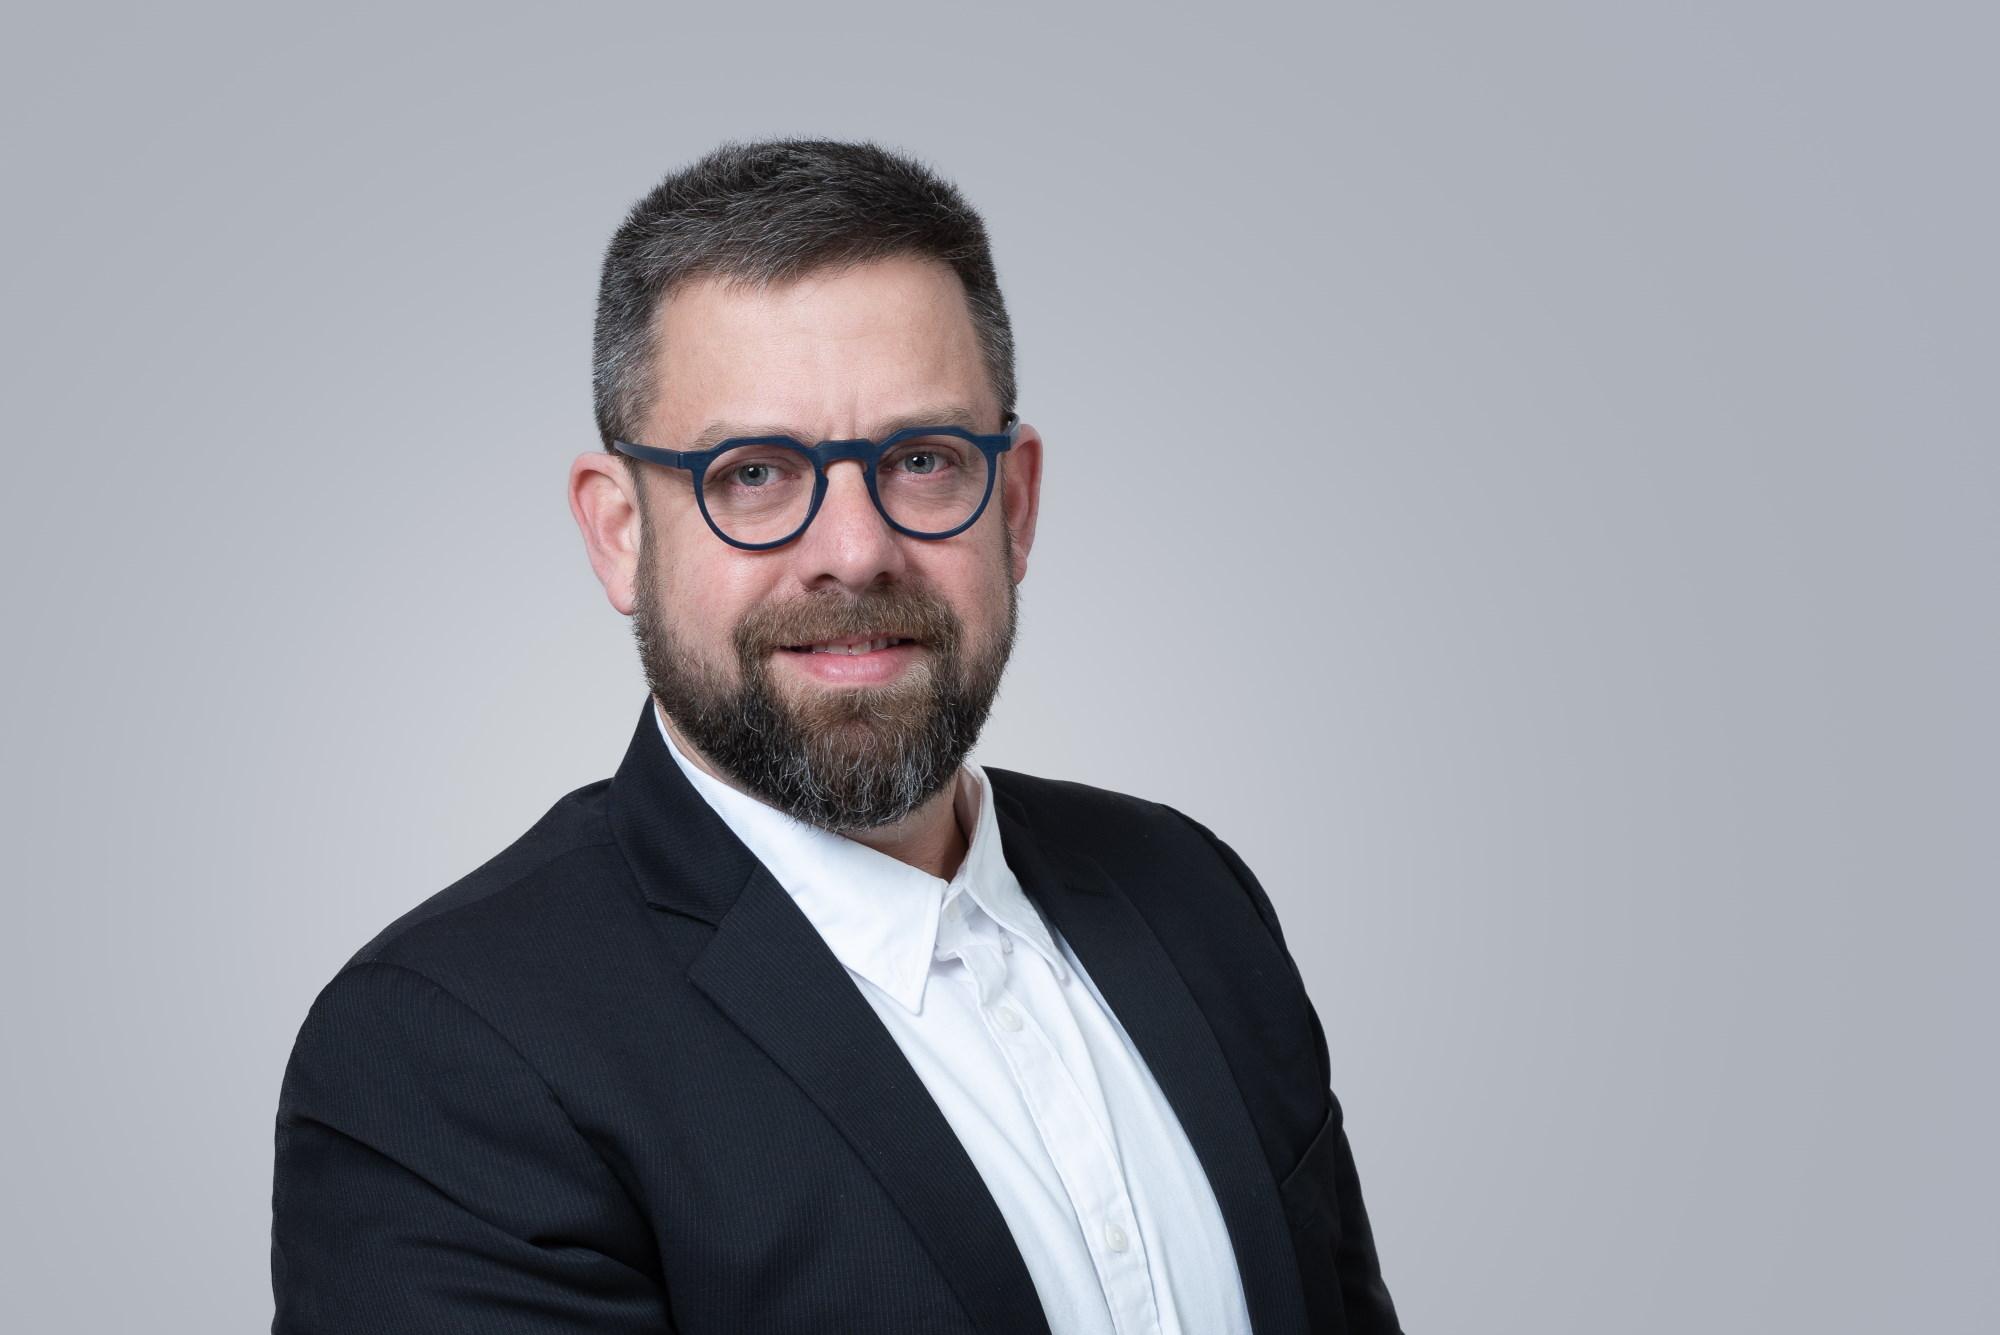 Дан Заичек / Dan Zajicek New CEO Spacecom